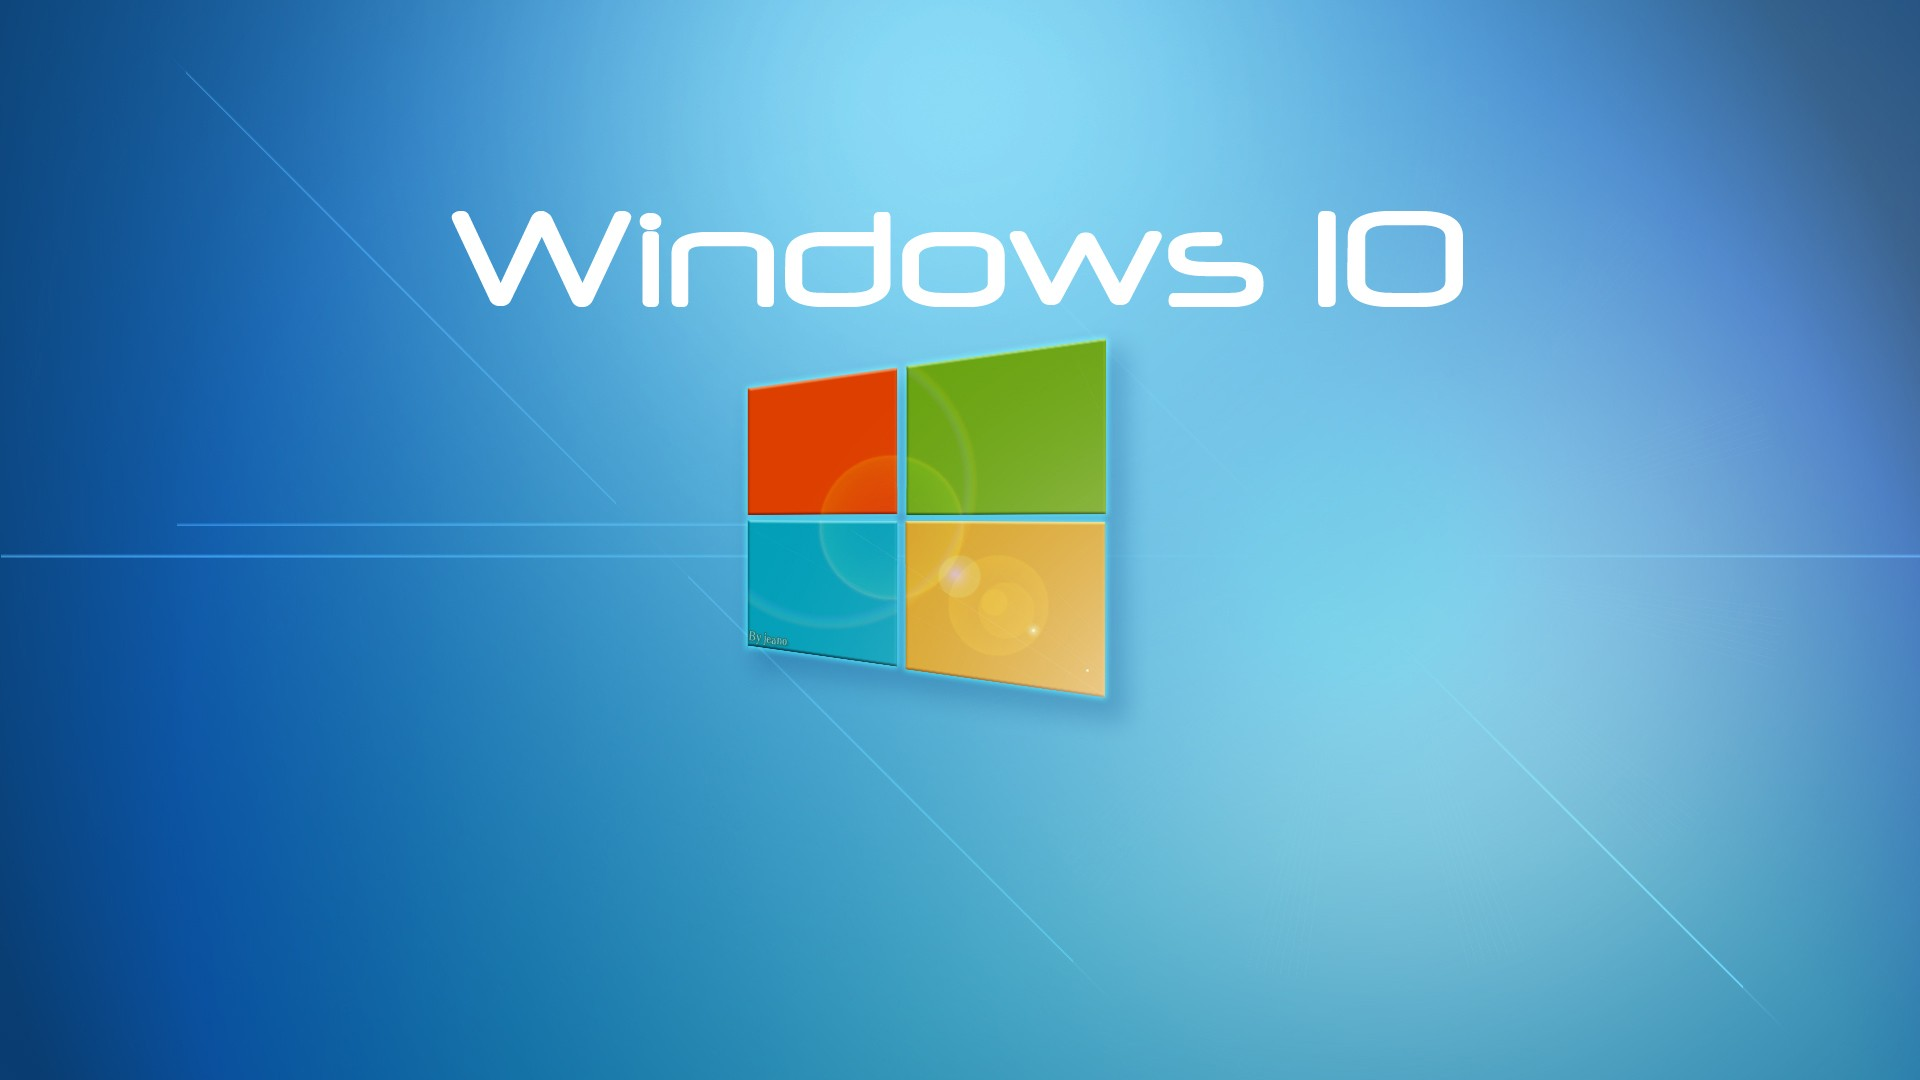 Windows 10 Desktop Wallpaper Download Free Cool Backgrounds For